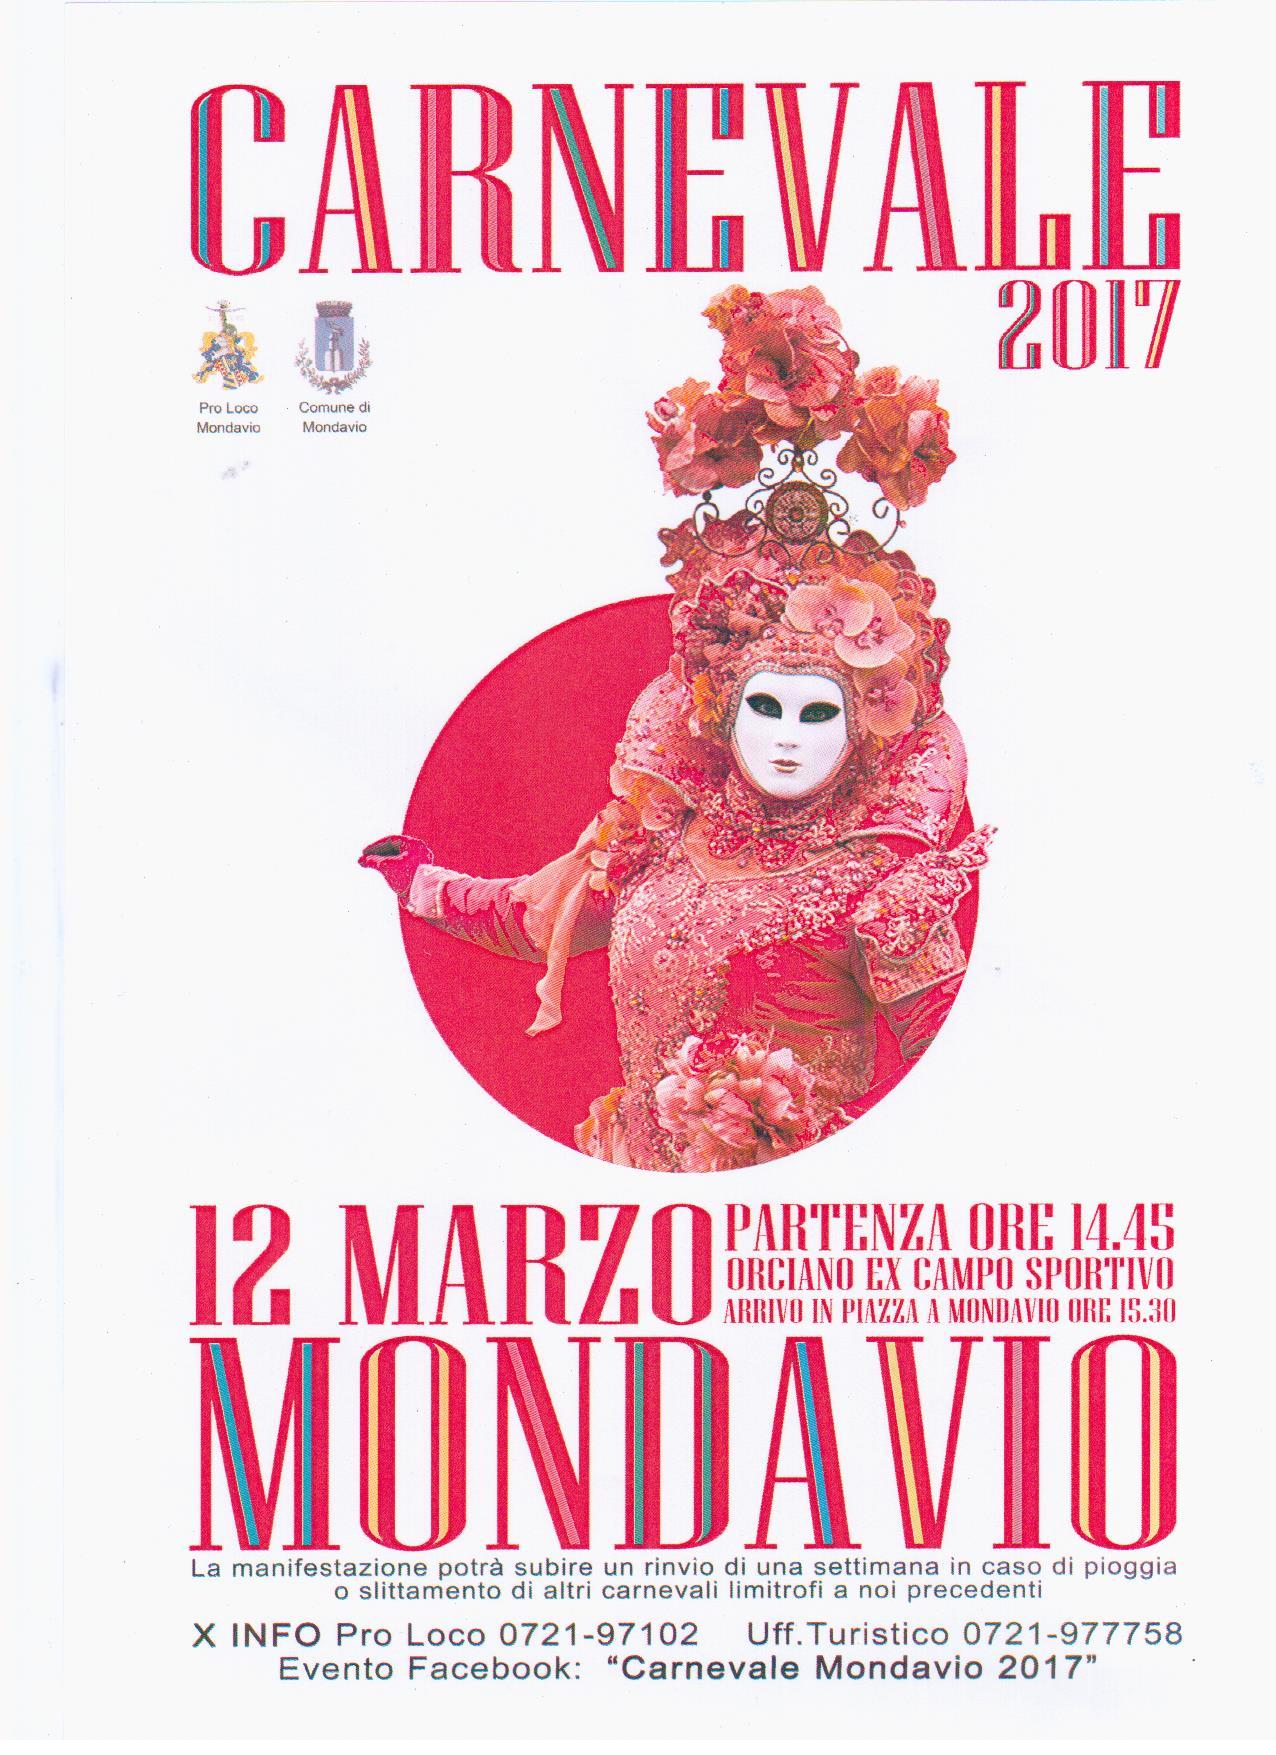 Carnevale 2017 🗓